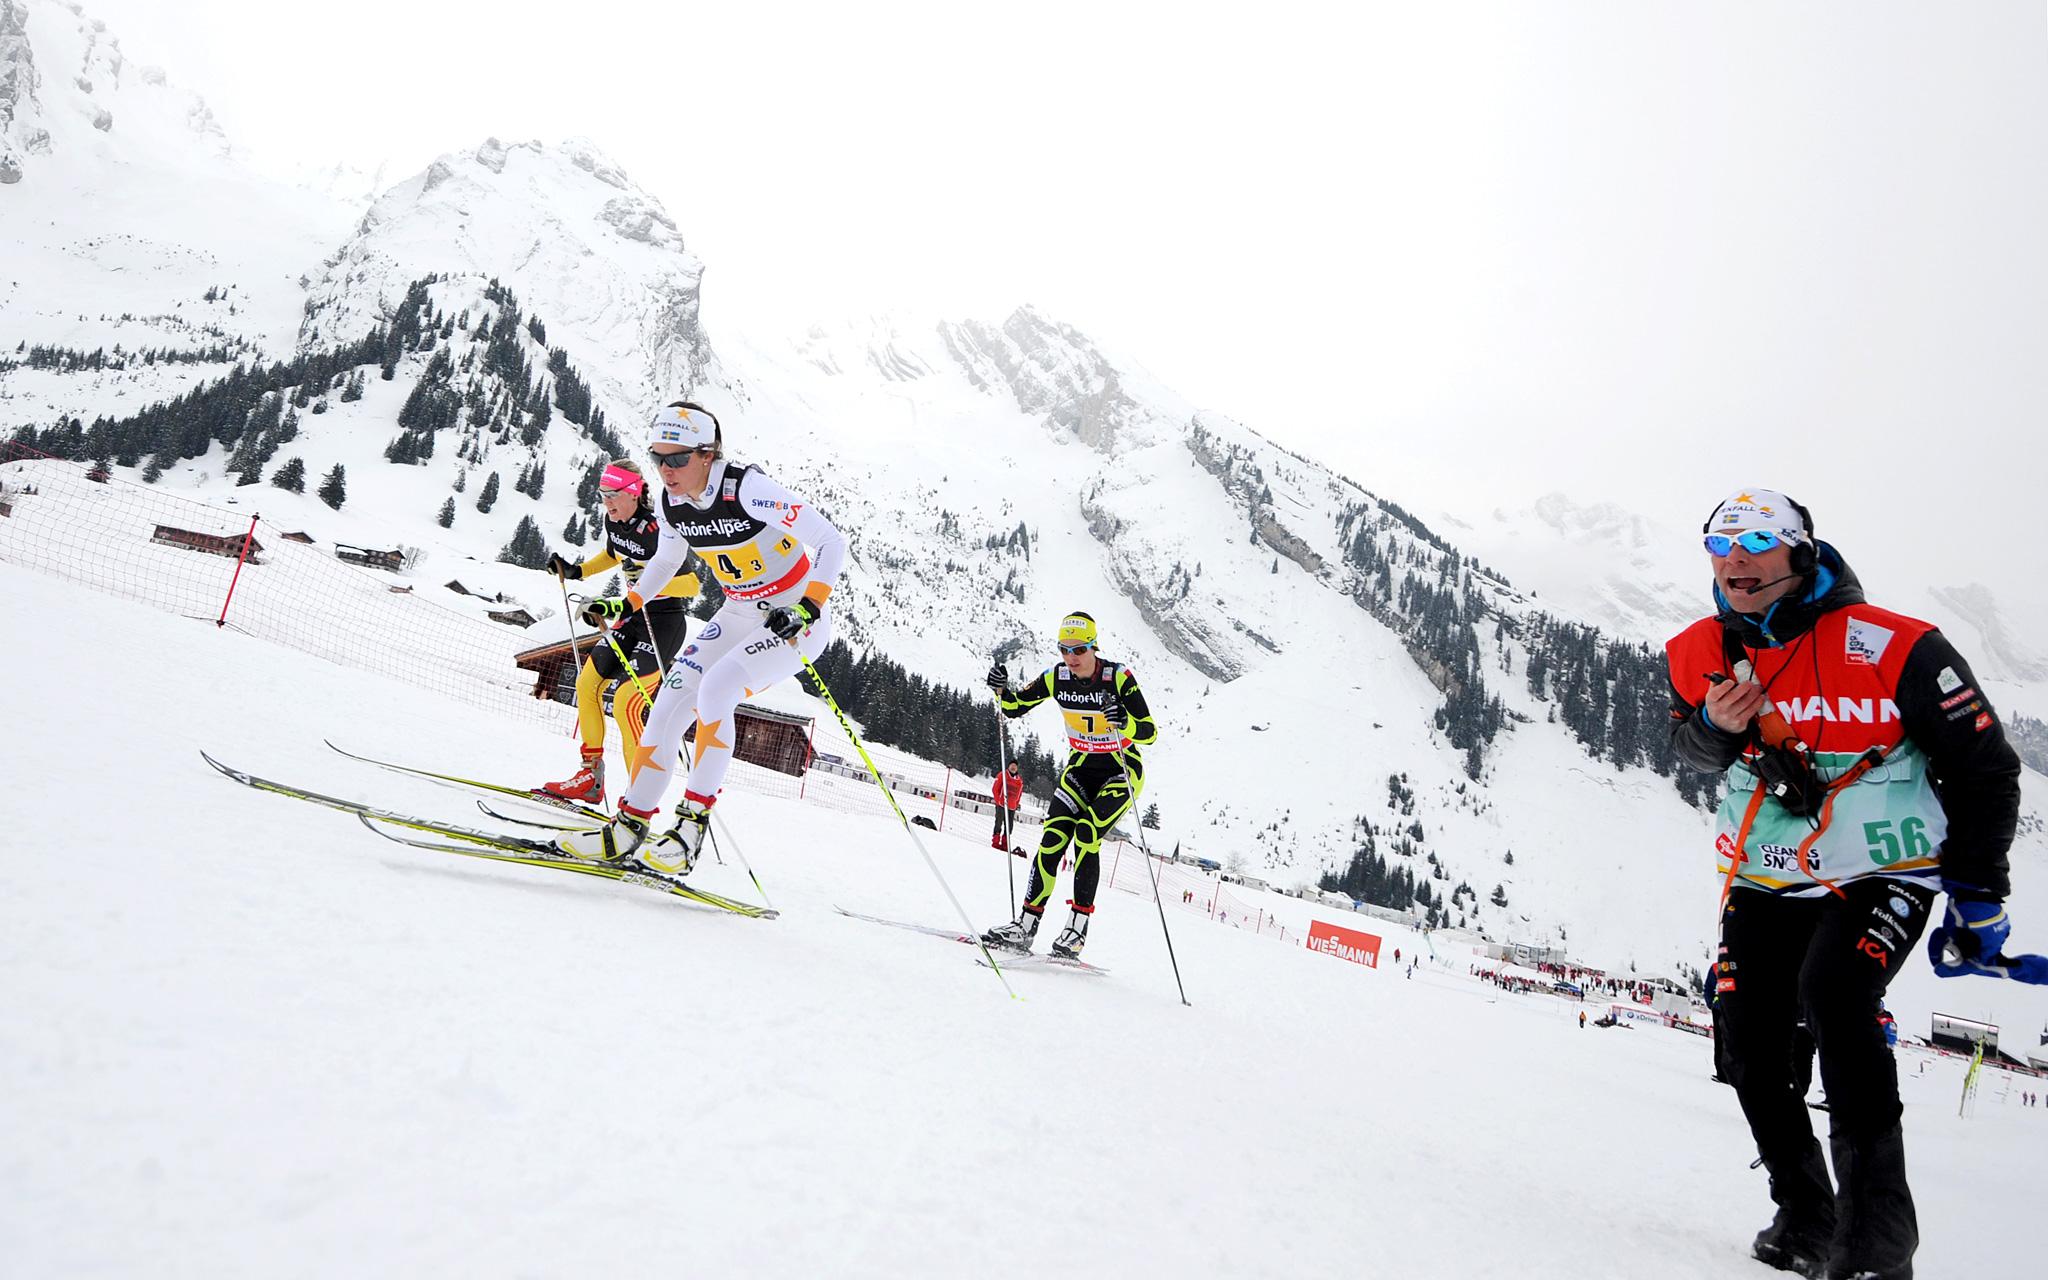 Nordic skiing combined